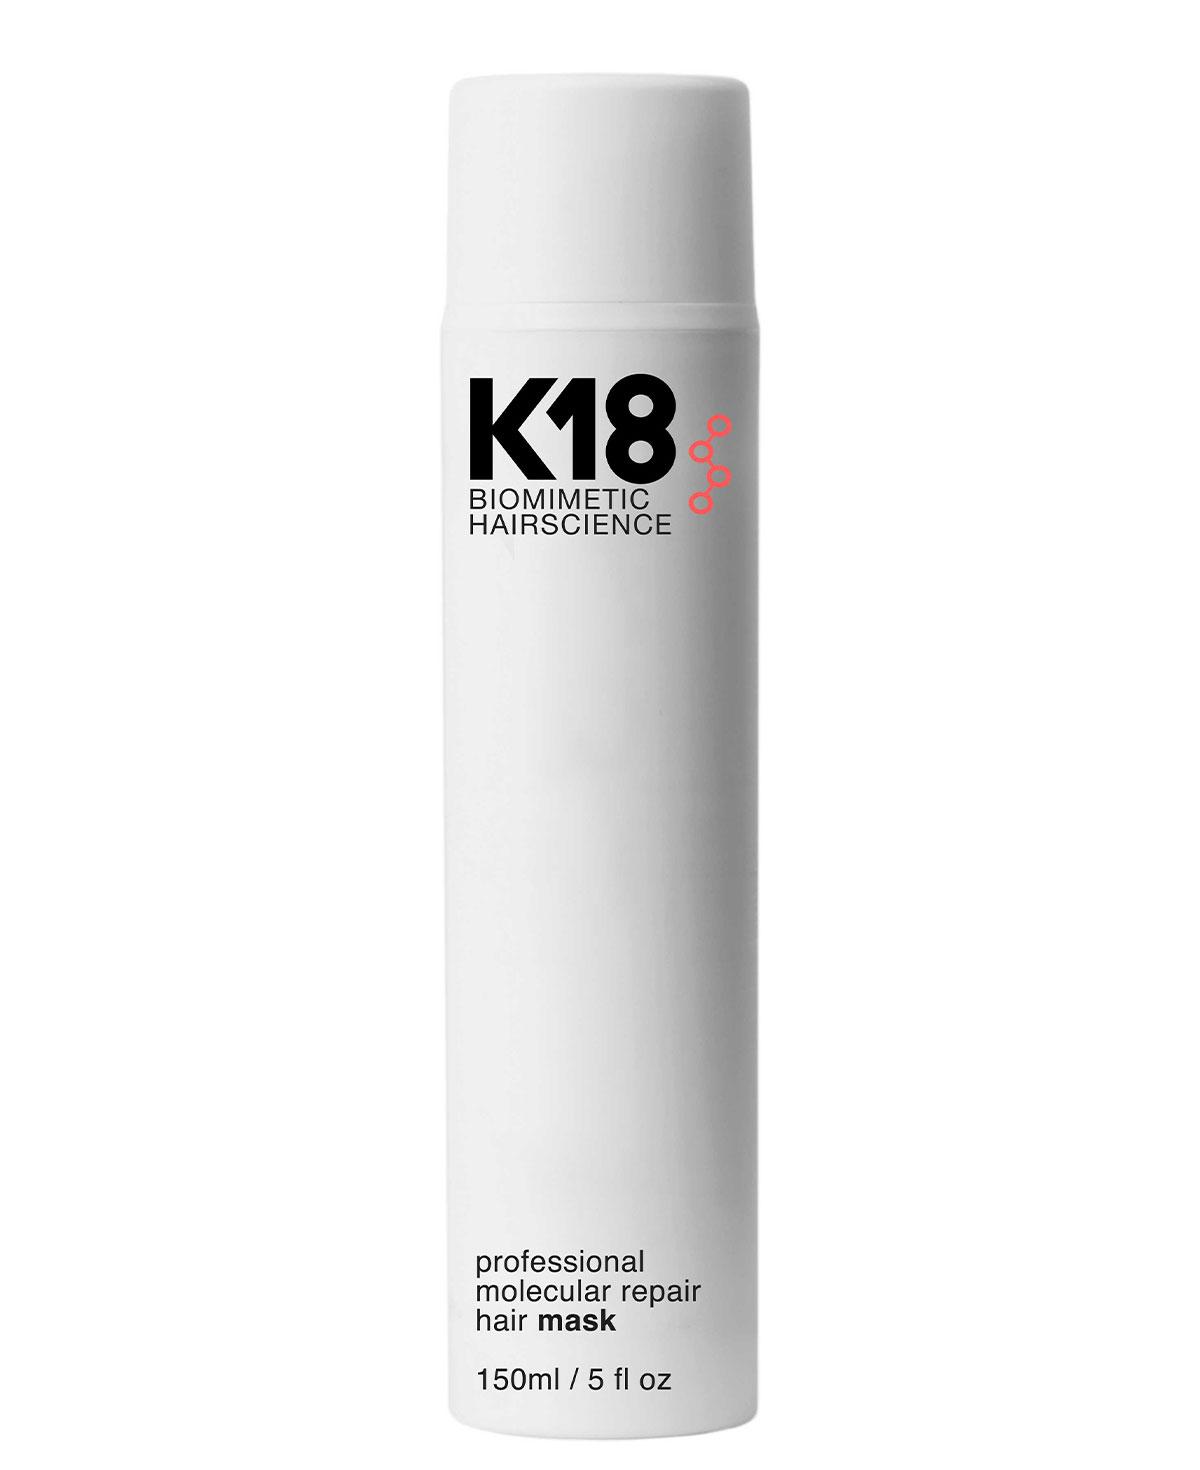 K18 Molecular Repair Hair Mask 150ml